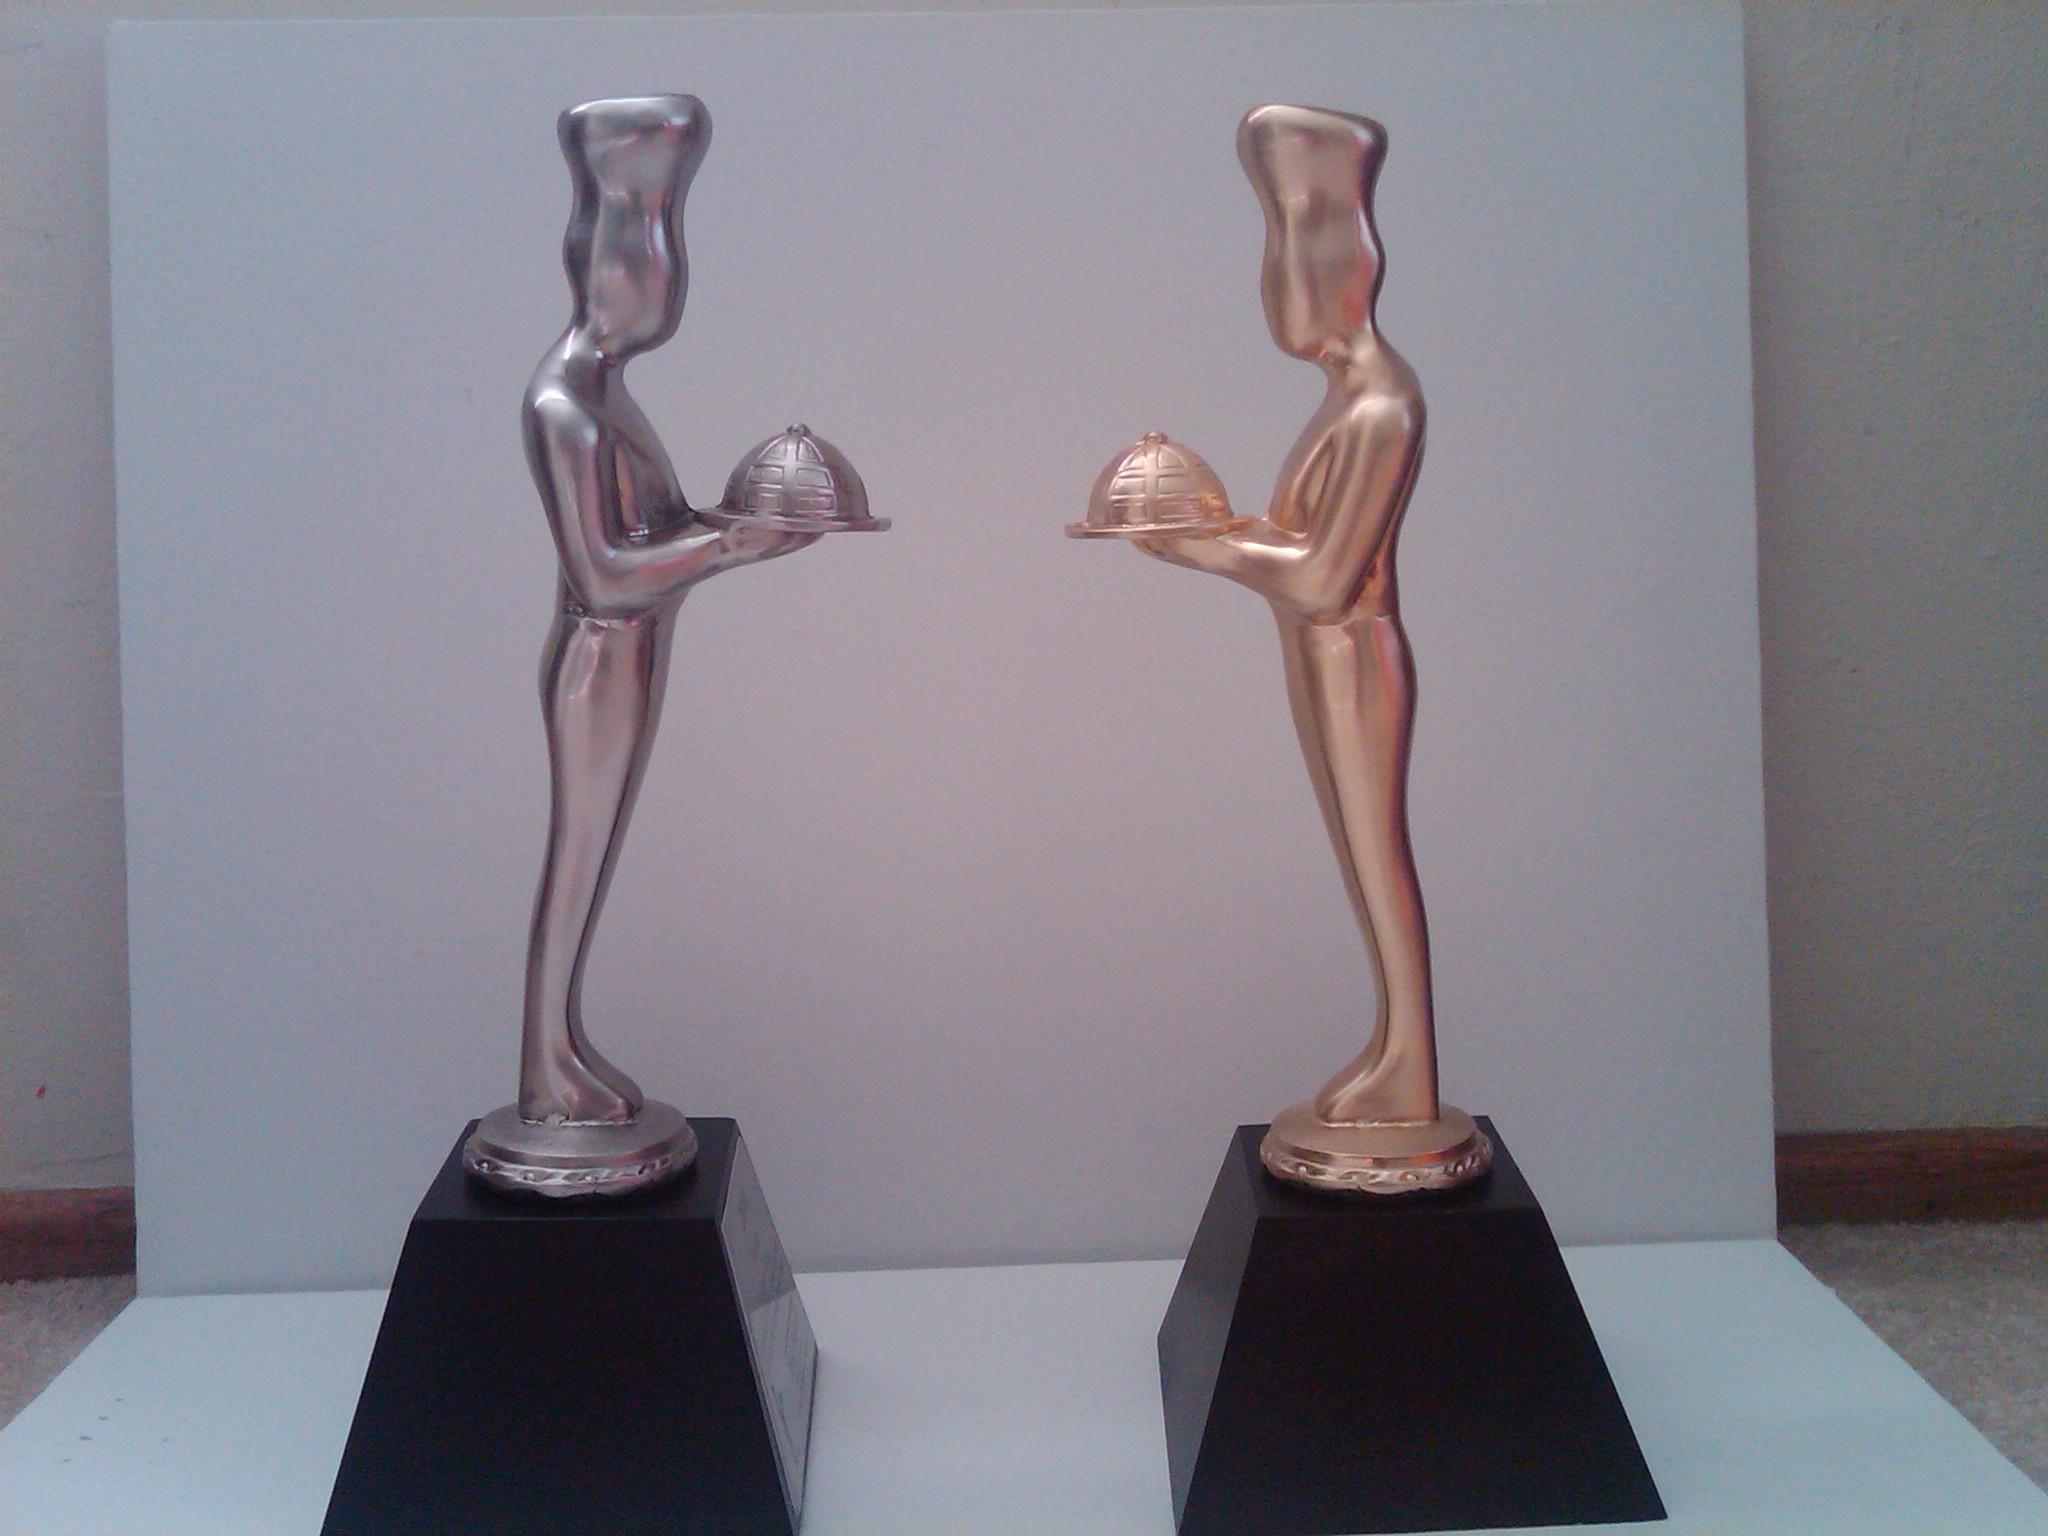 Silver Finalist sofi Trophy & Gold sofi Trophy